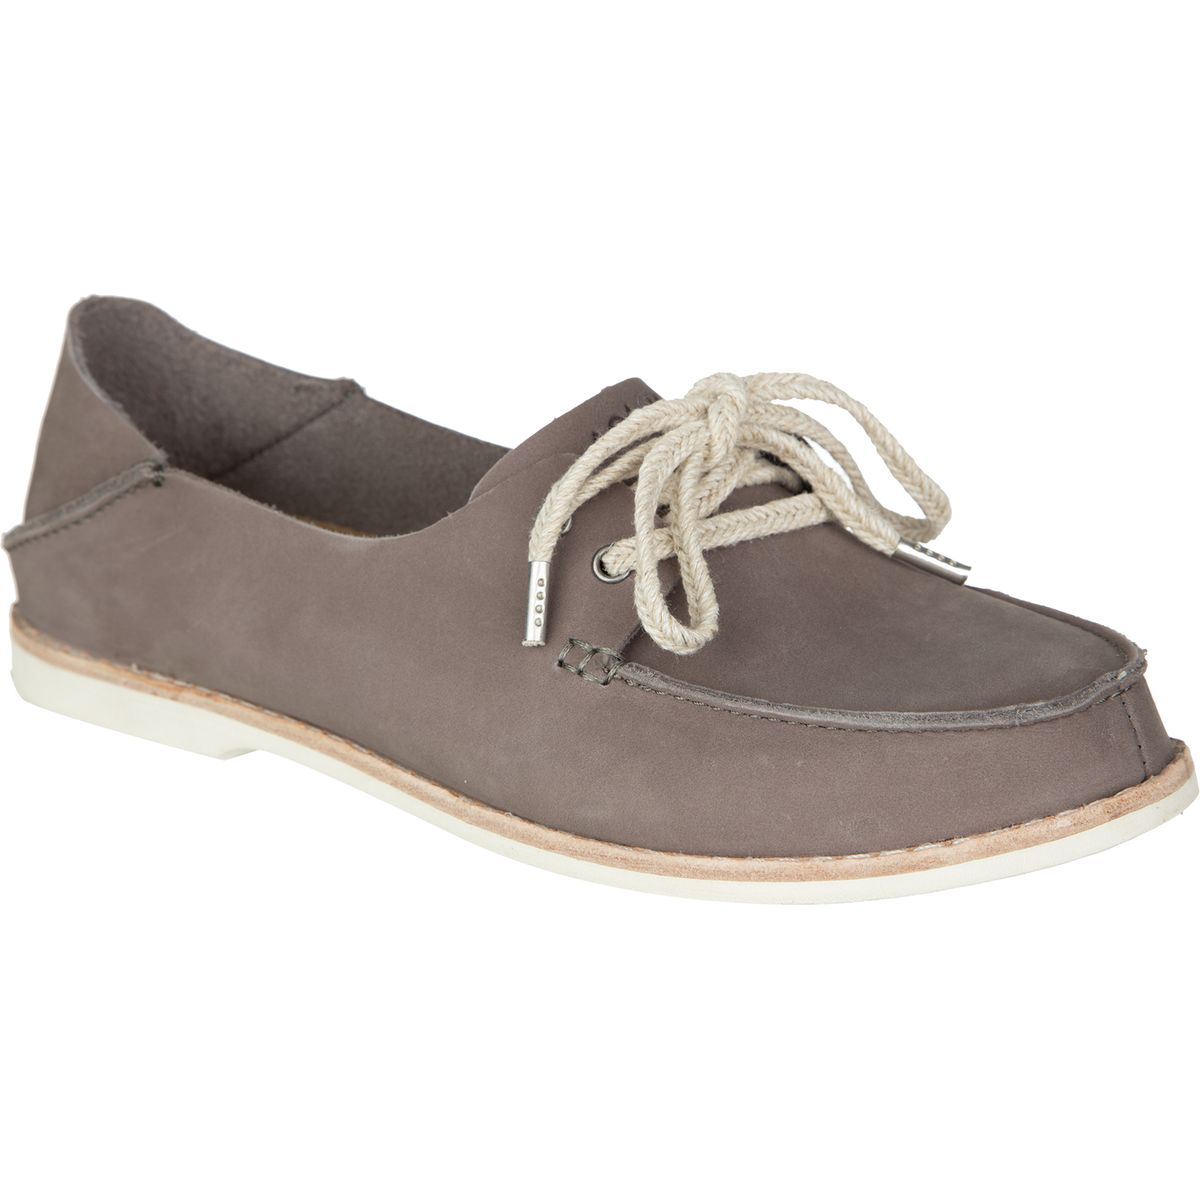 Olukai Moku Leather Shoe - Women's